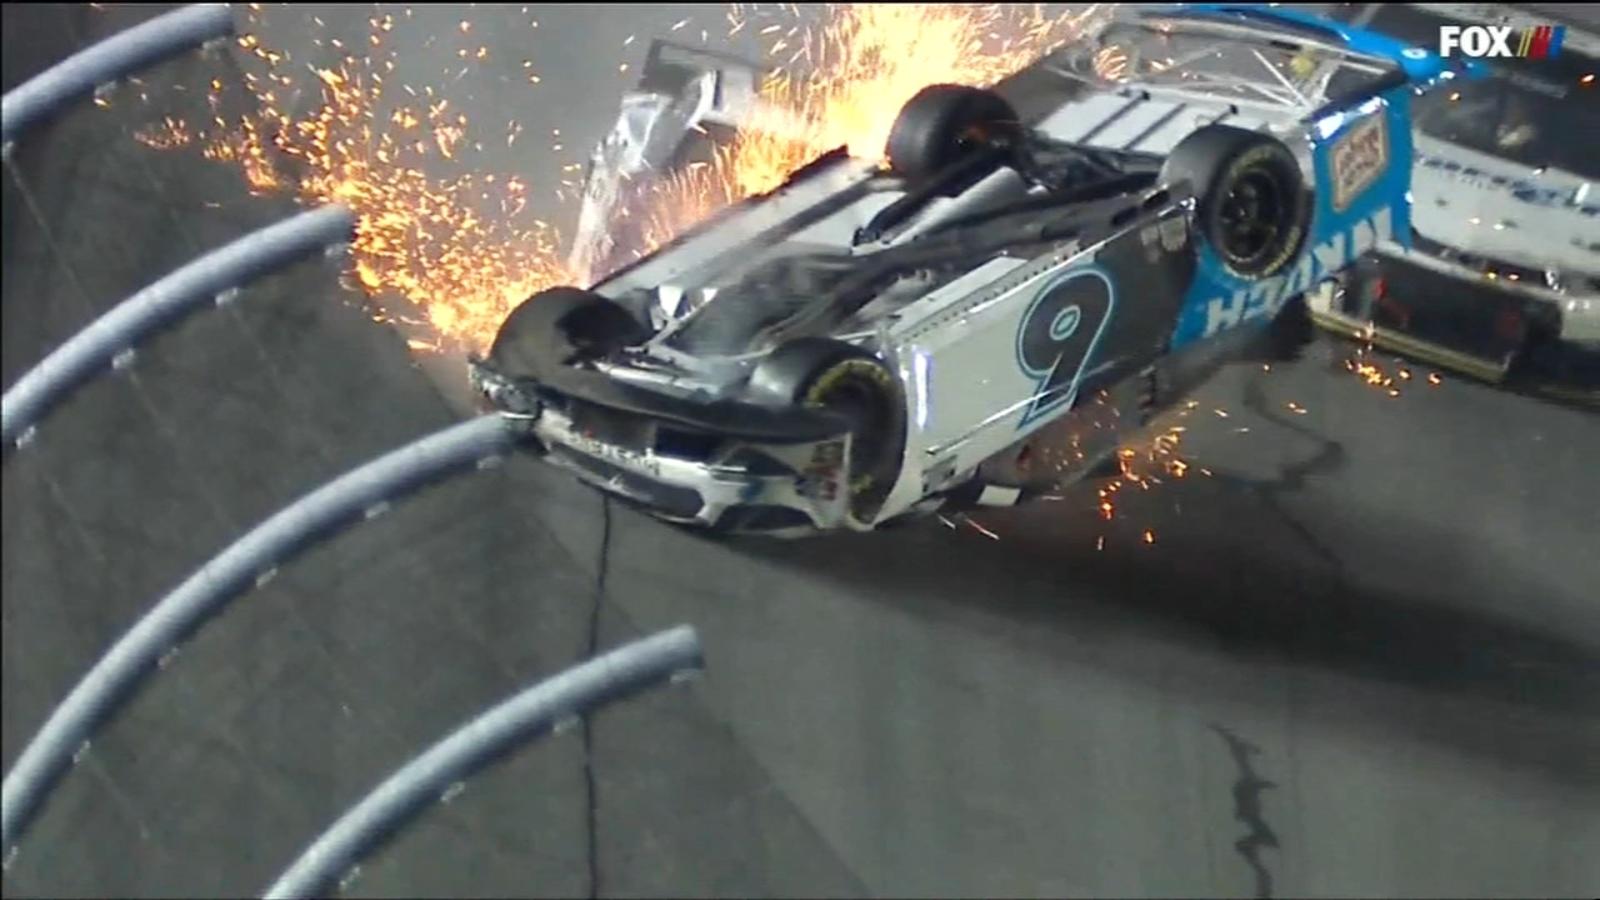 Daytona 500 crash sends Ryan Newman to hospital, injuries not life-threatening; Denny Hamlin wins race - WLS-TV